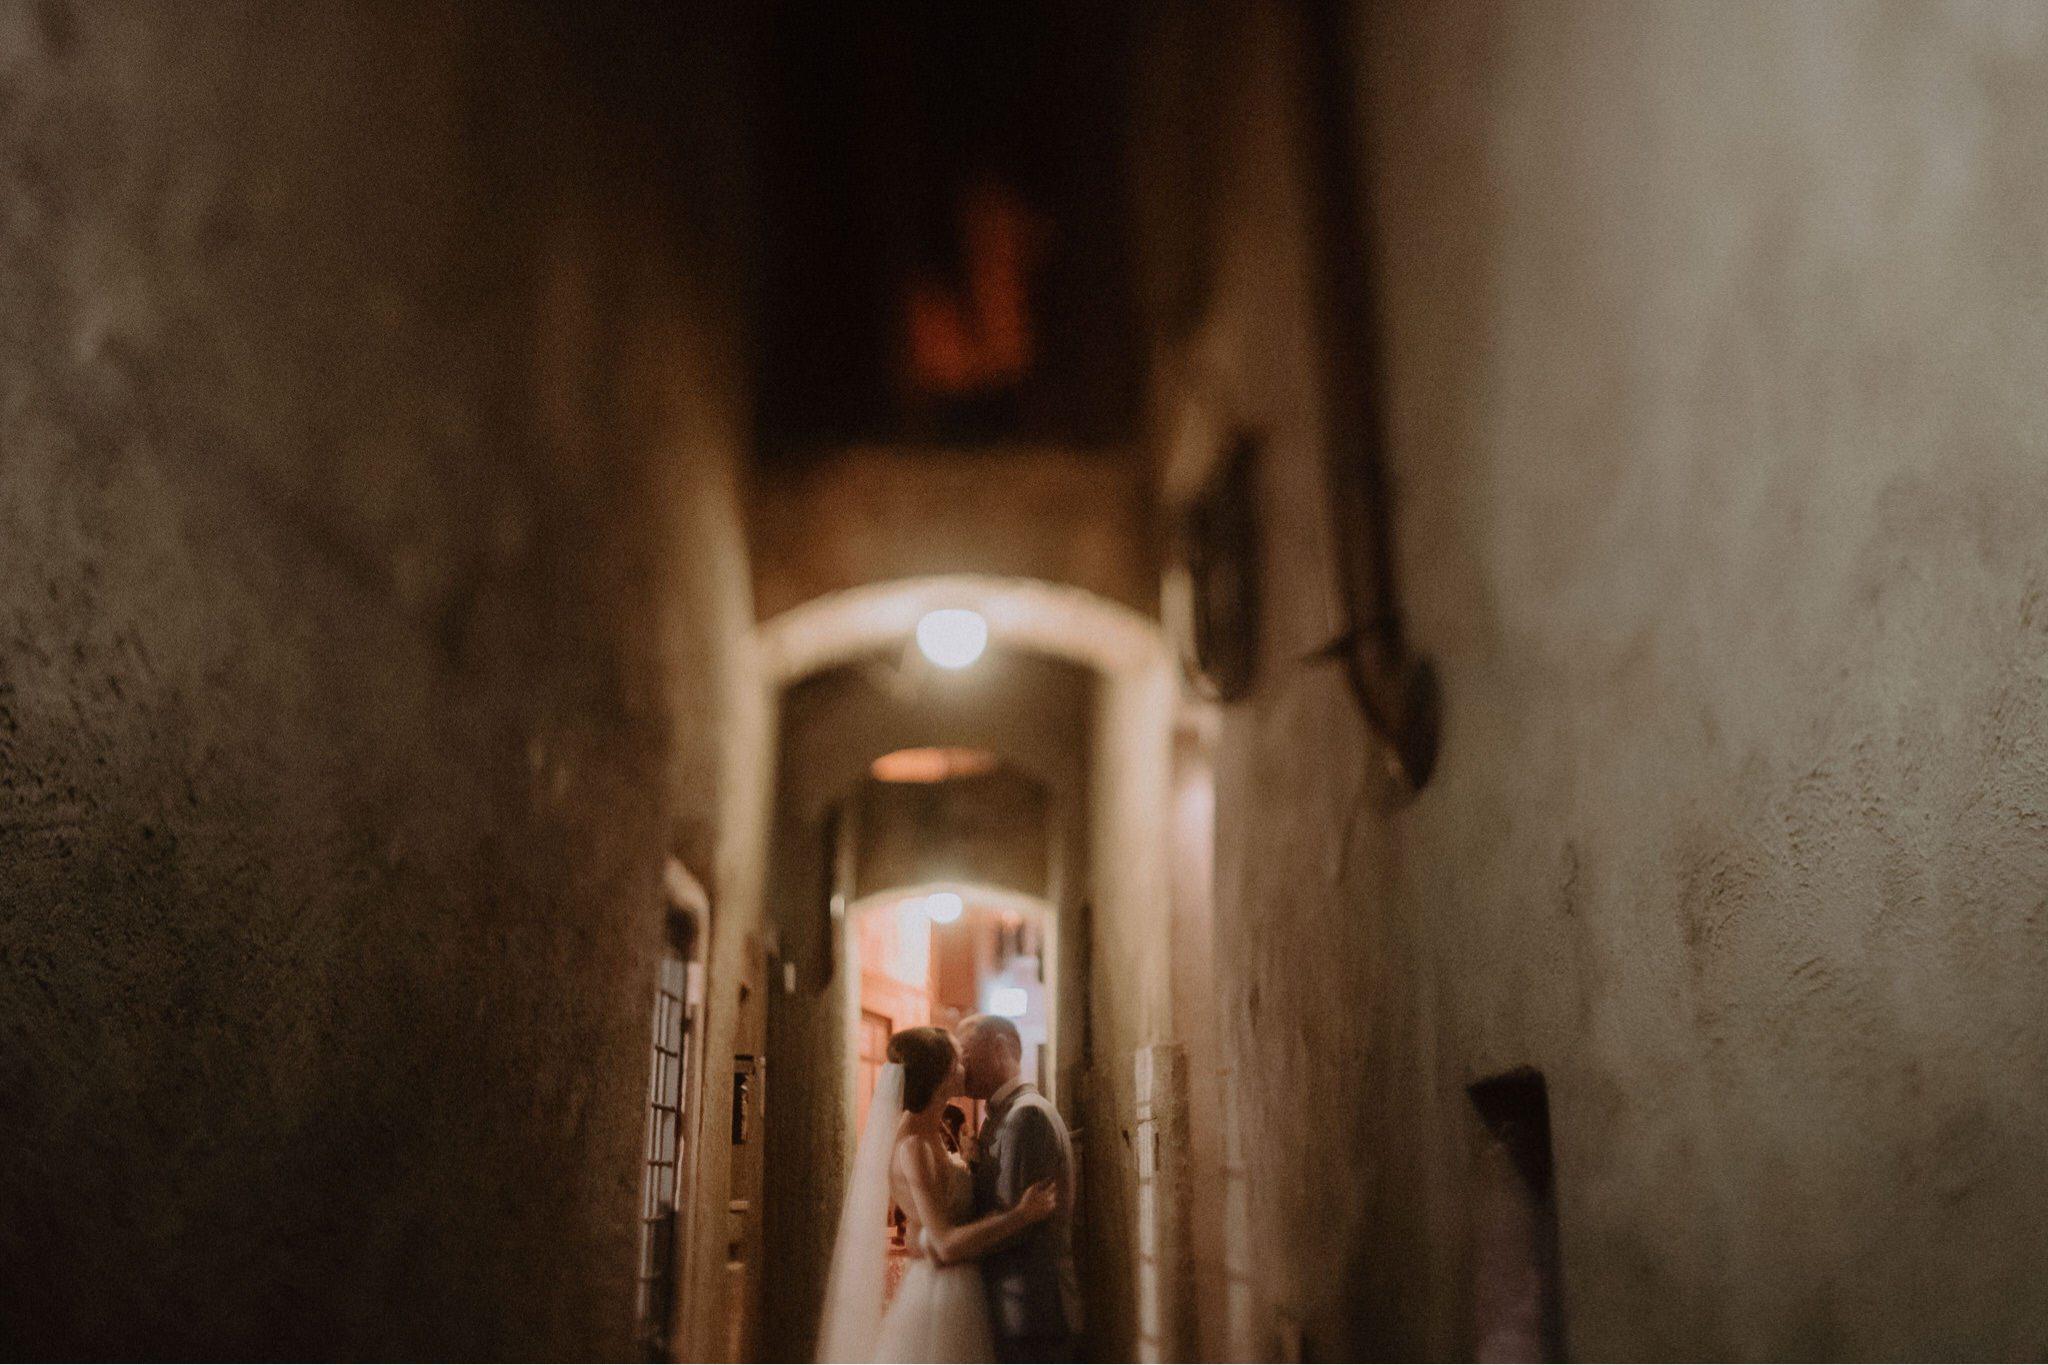 65 la 04 abend 1203 weddinphotographer Hochzeitsfotograf newzealand hamilton Weddingphotography Stuttgart